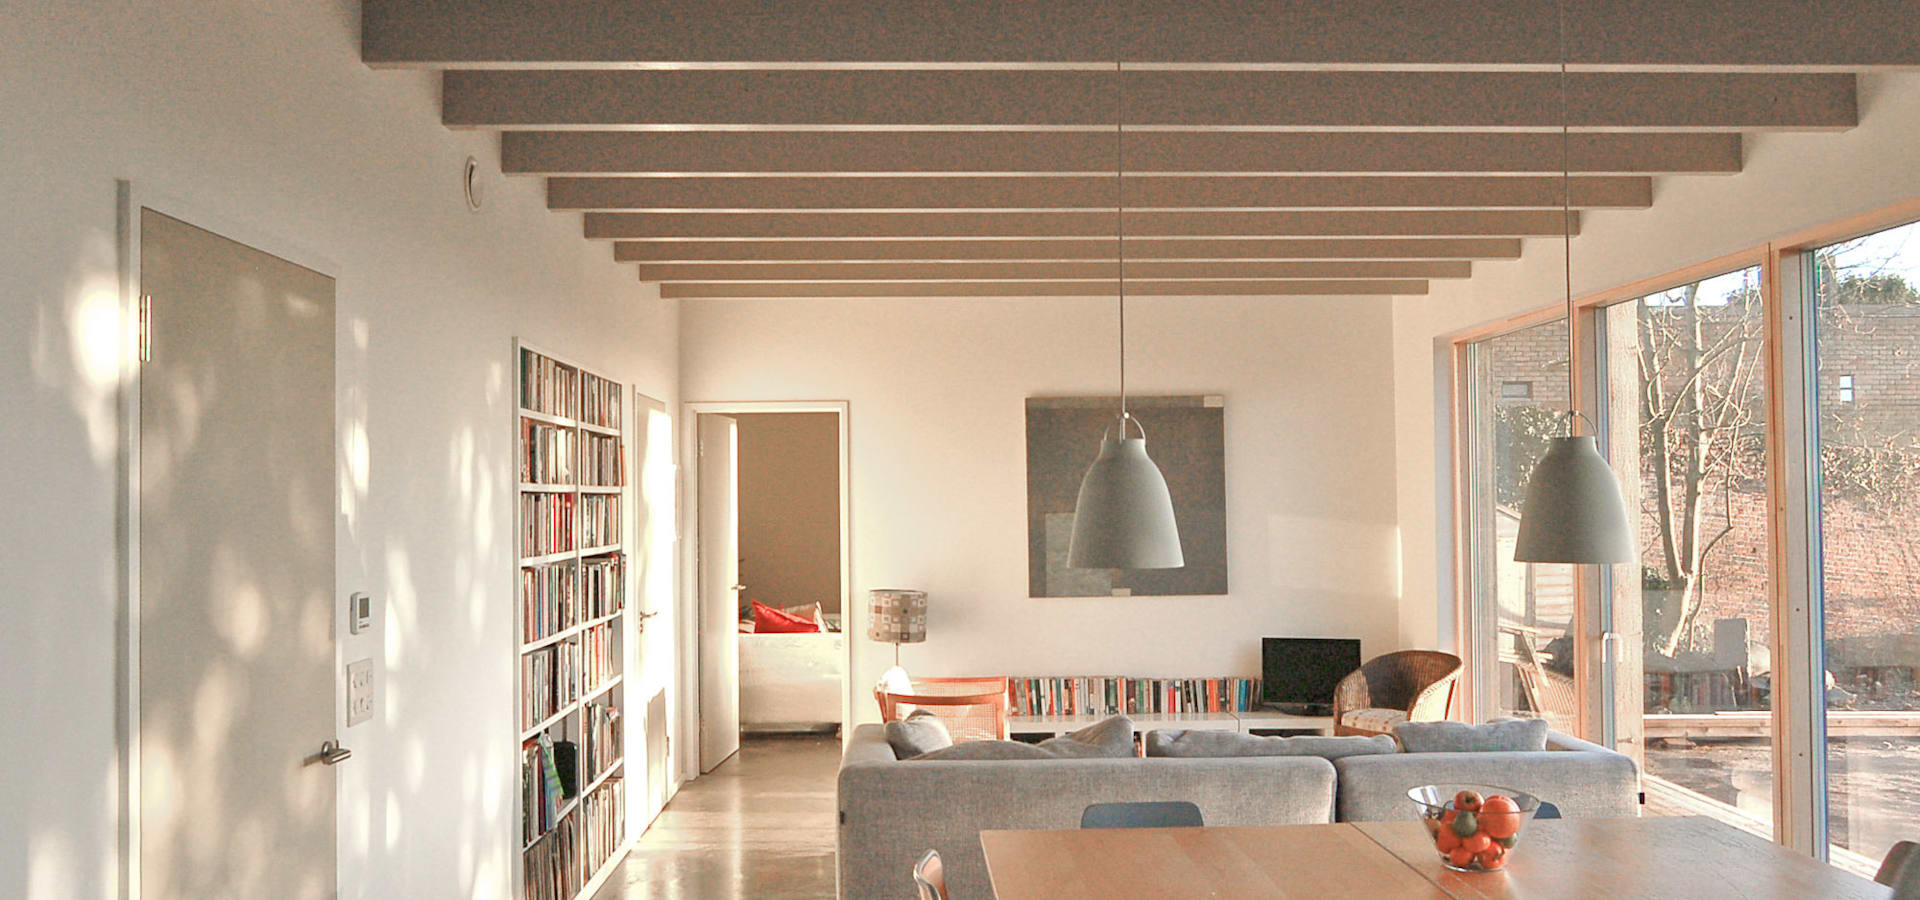 Emmett Russell Architects